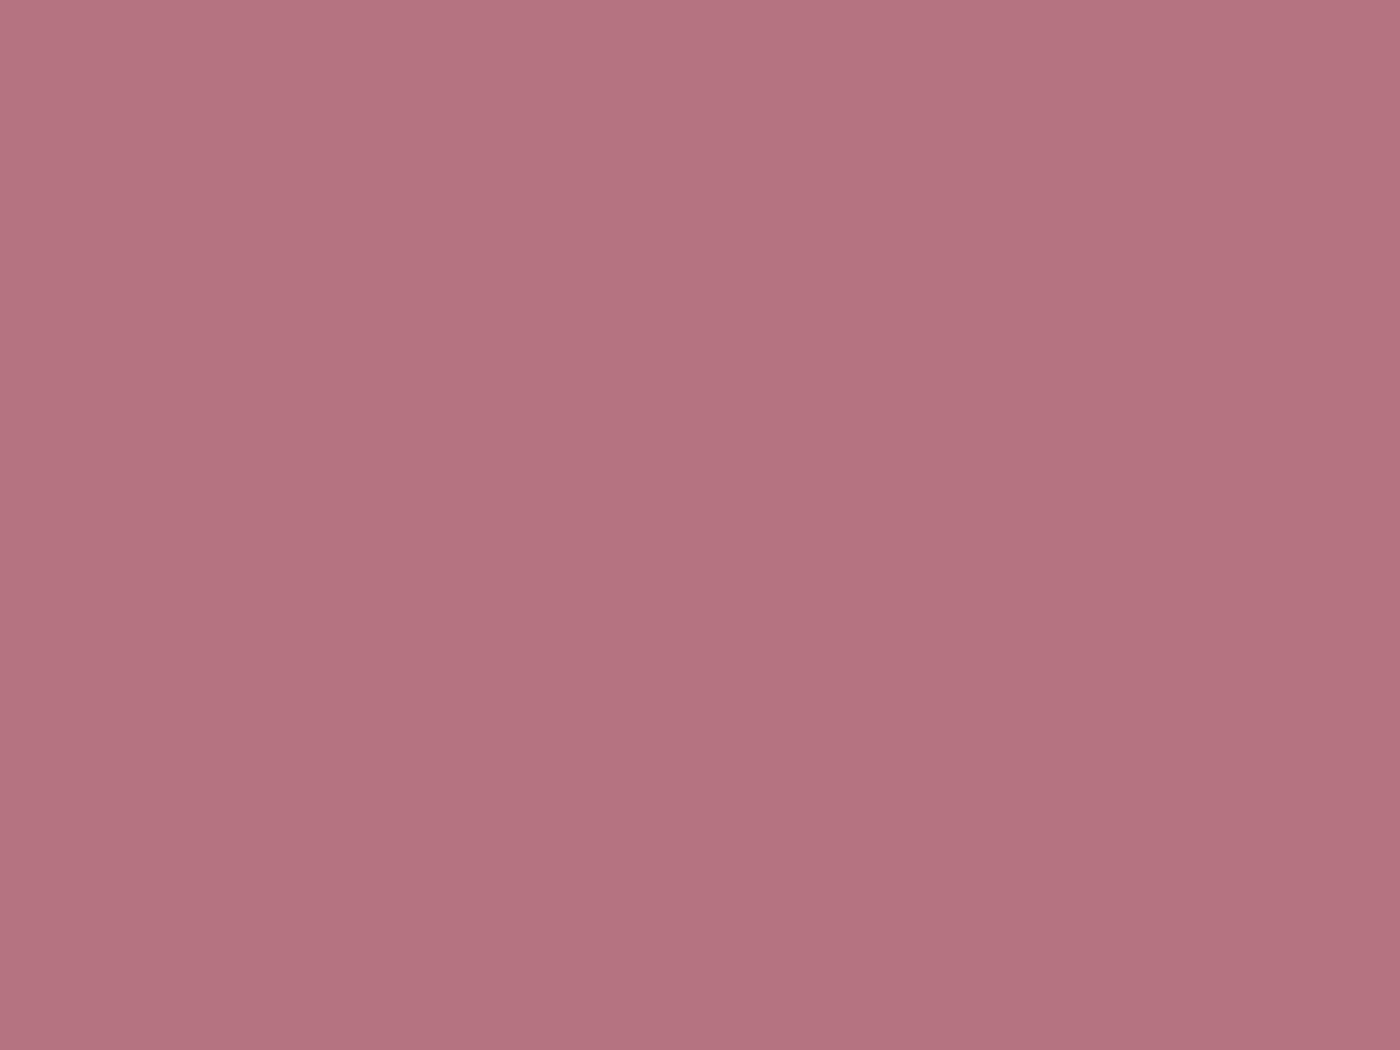 1400x1050 Turkish Rose Solid Color Background